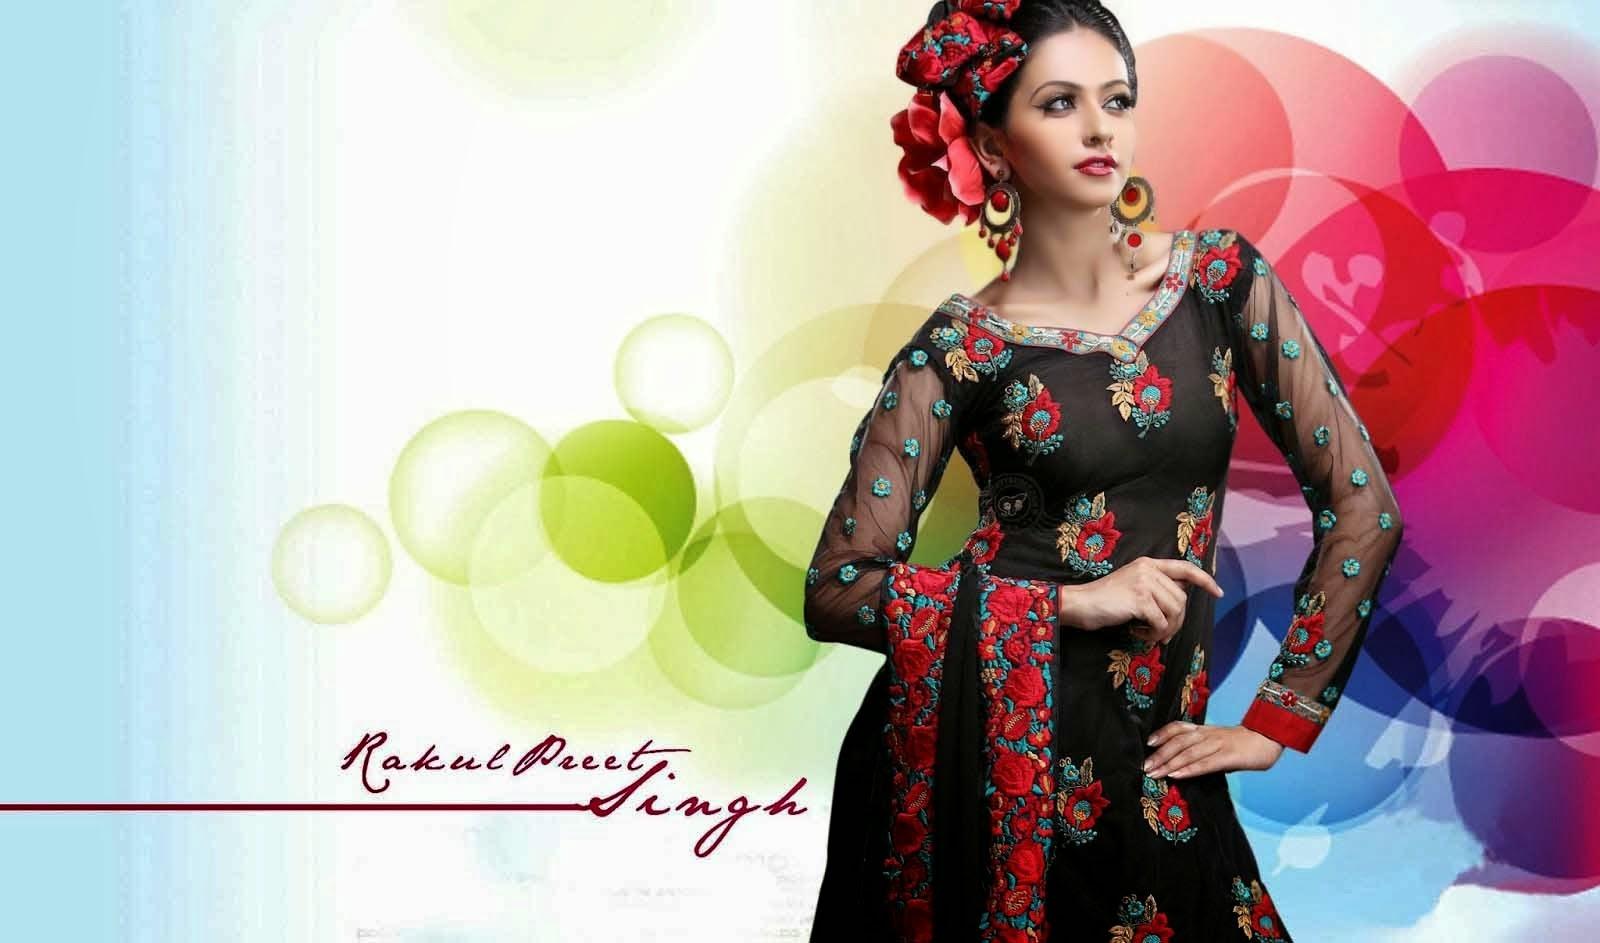 Rakul Preet Singh Hot HD Wallpaper 2014 Free Download